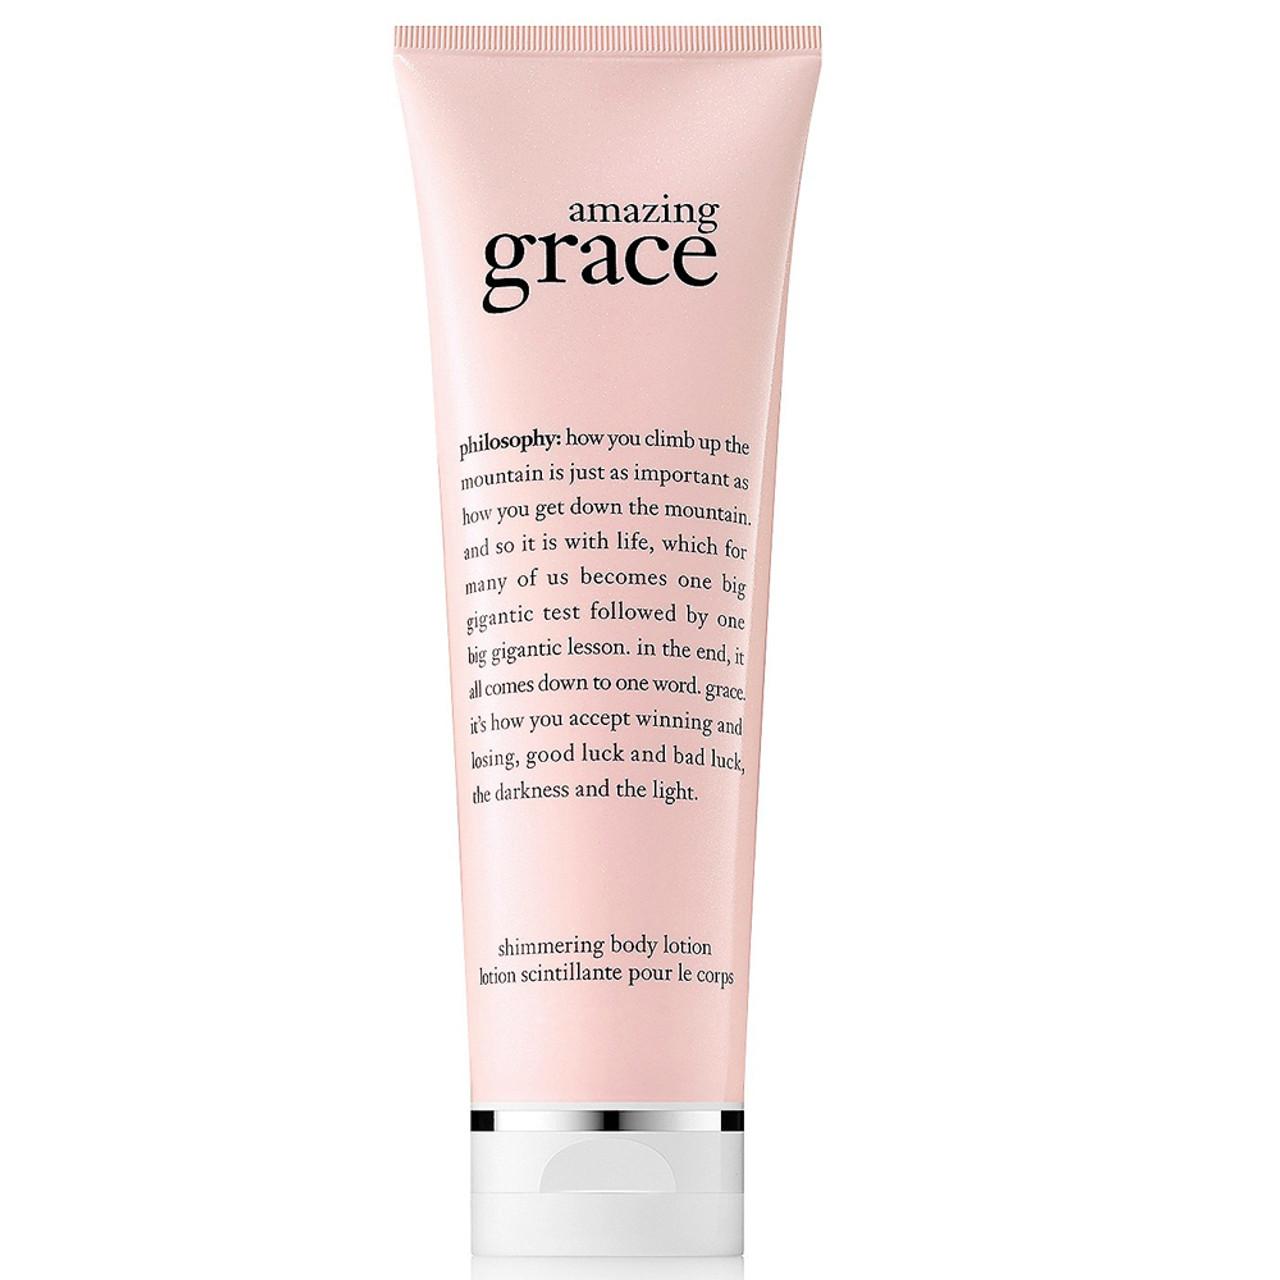 philosophy Amazing Grace Shimmering Body Lotion BeautifiedYou.com